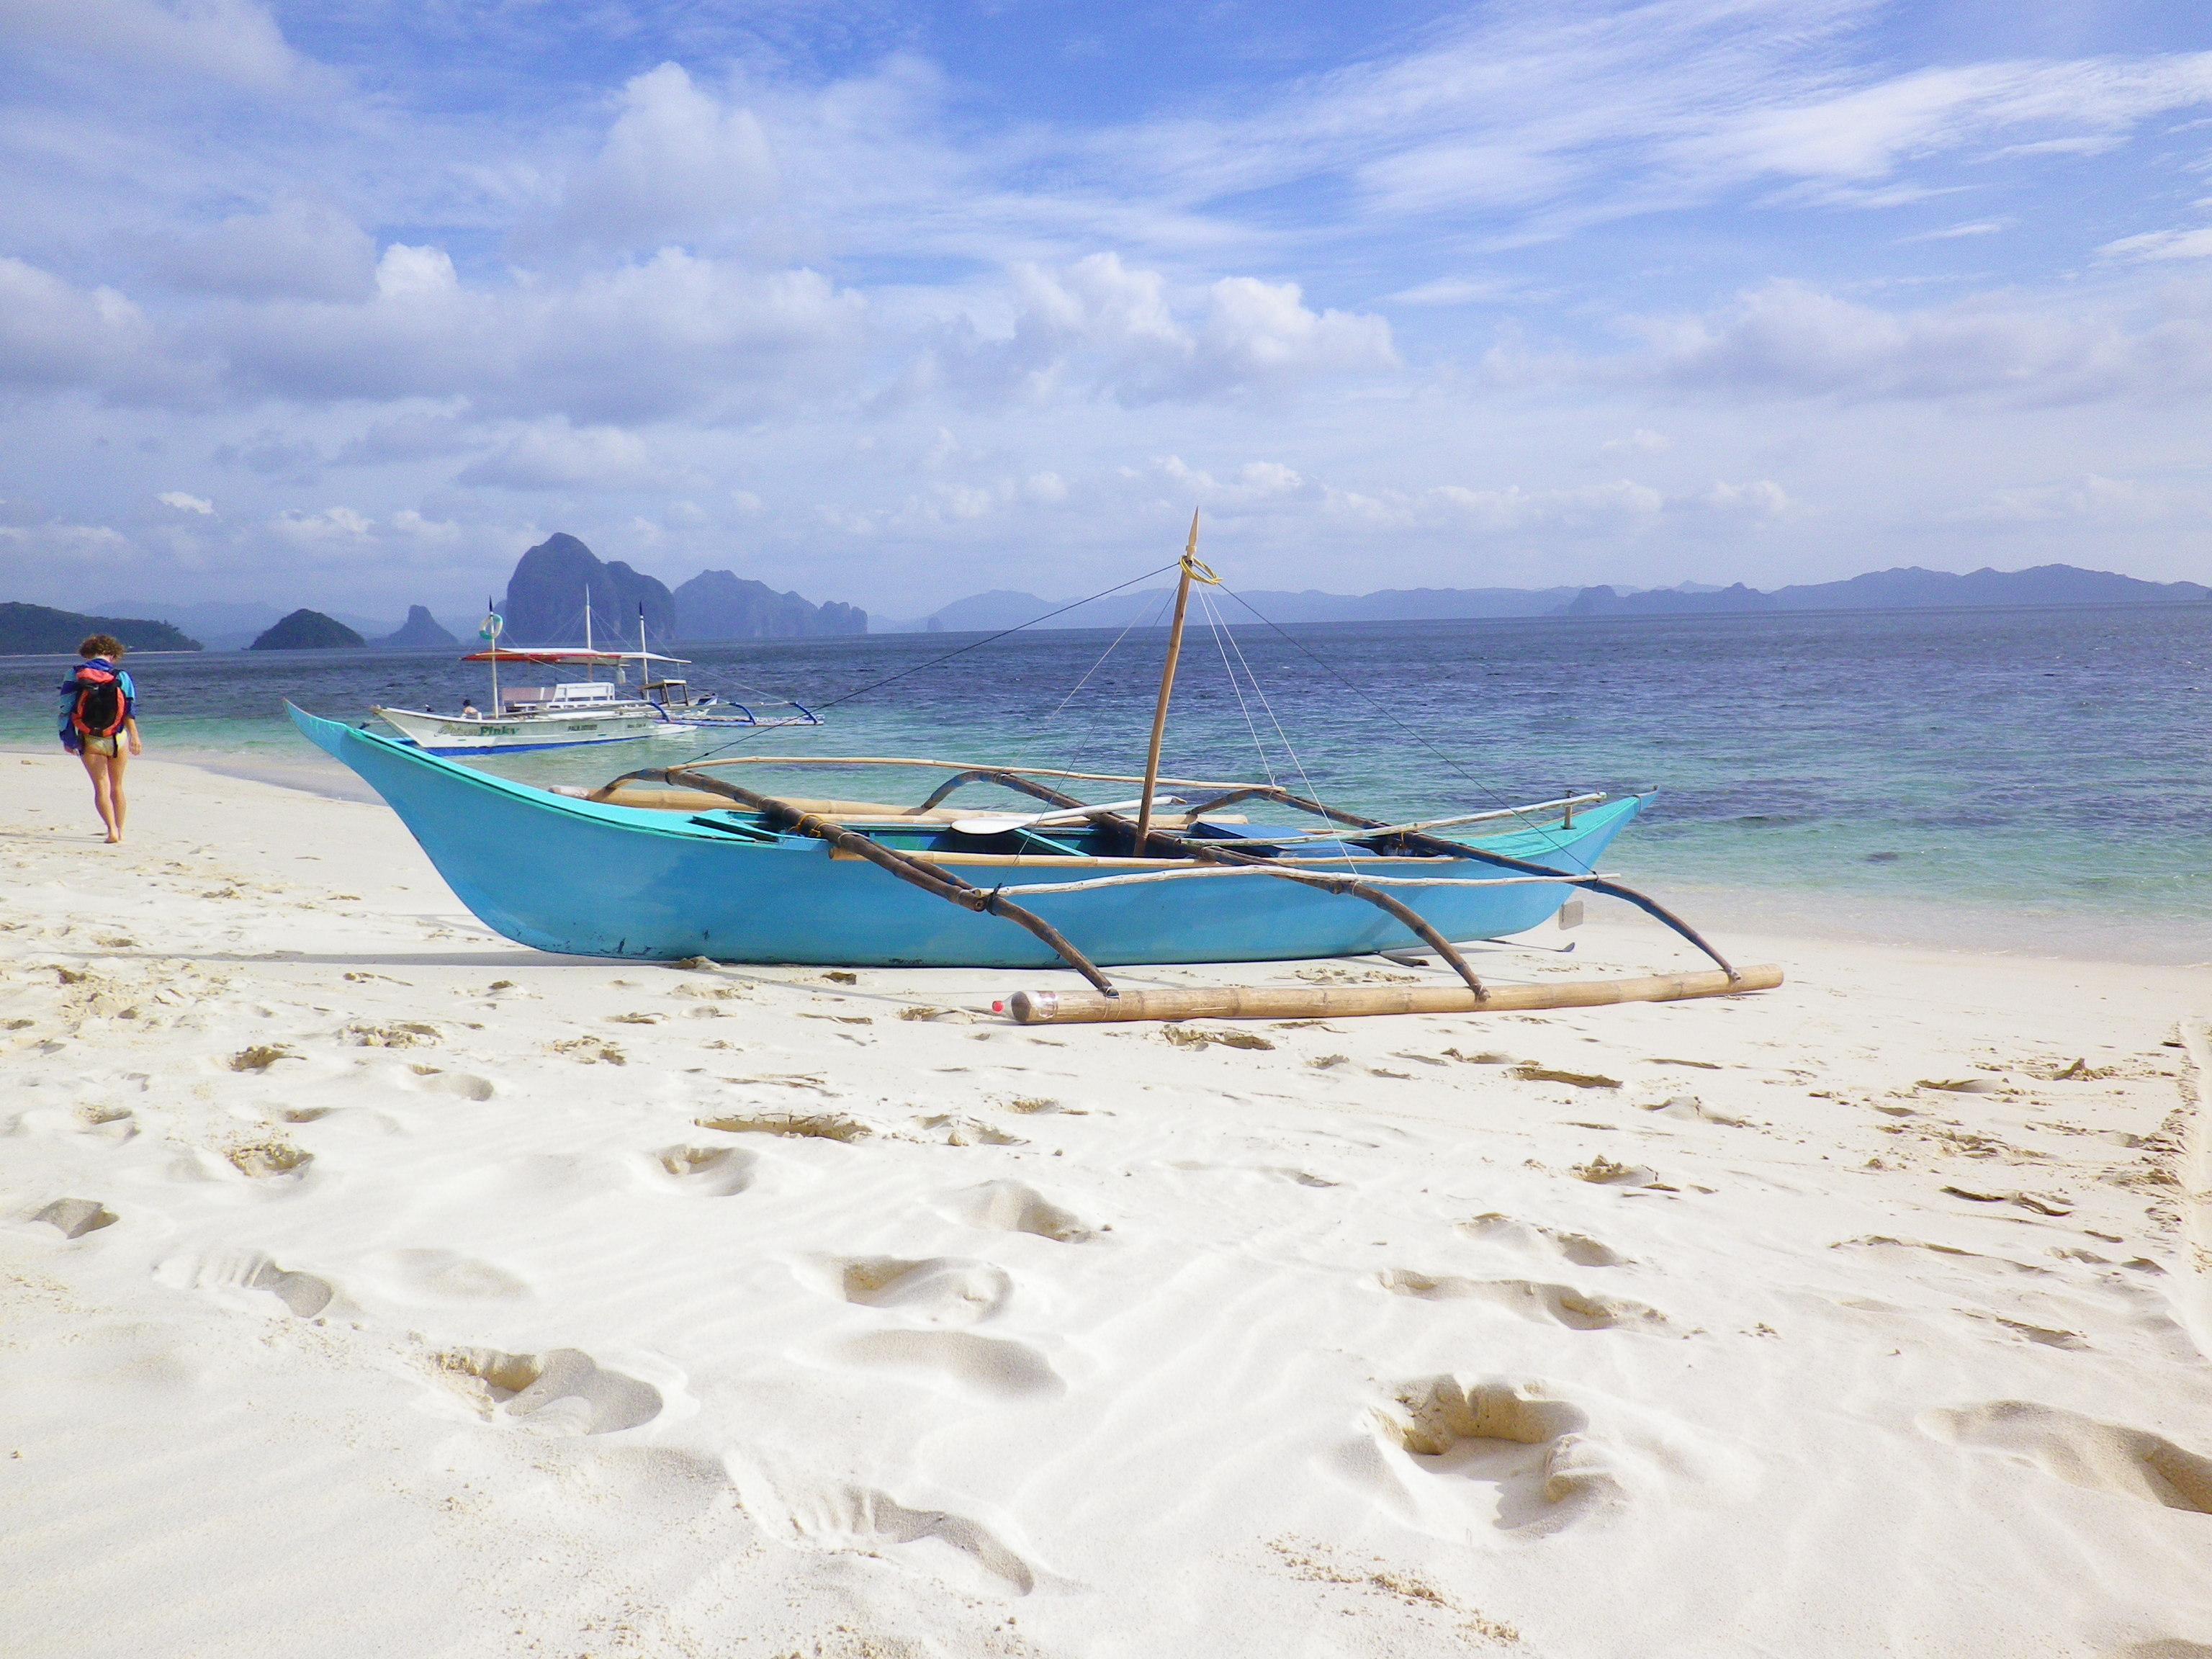 Tour avventura Palawan Puerto Princesa, Honday Bay e Fiume sotterraneo